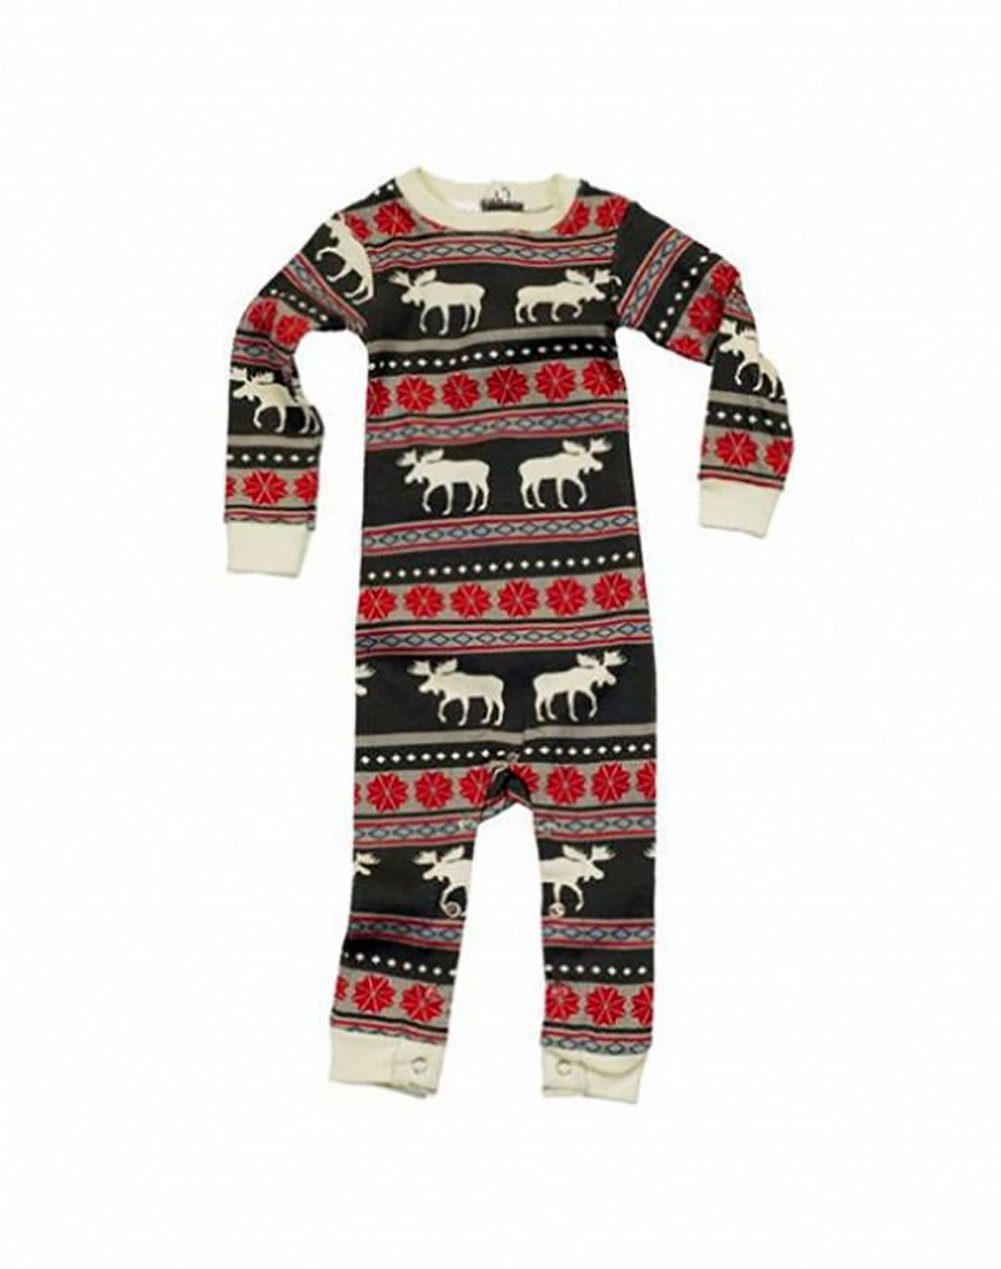 Pijamas de Navidad Familia Conjunto Pantalon y Top Fiesta Manga Larga Trajes Navideños Reno Pijama Dos Piezas Mujer… 1